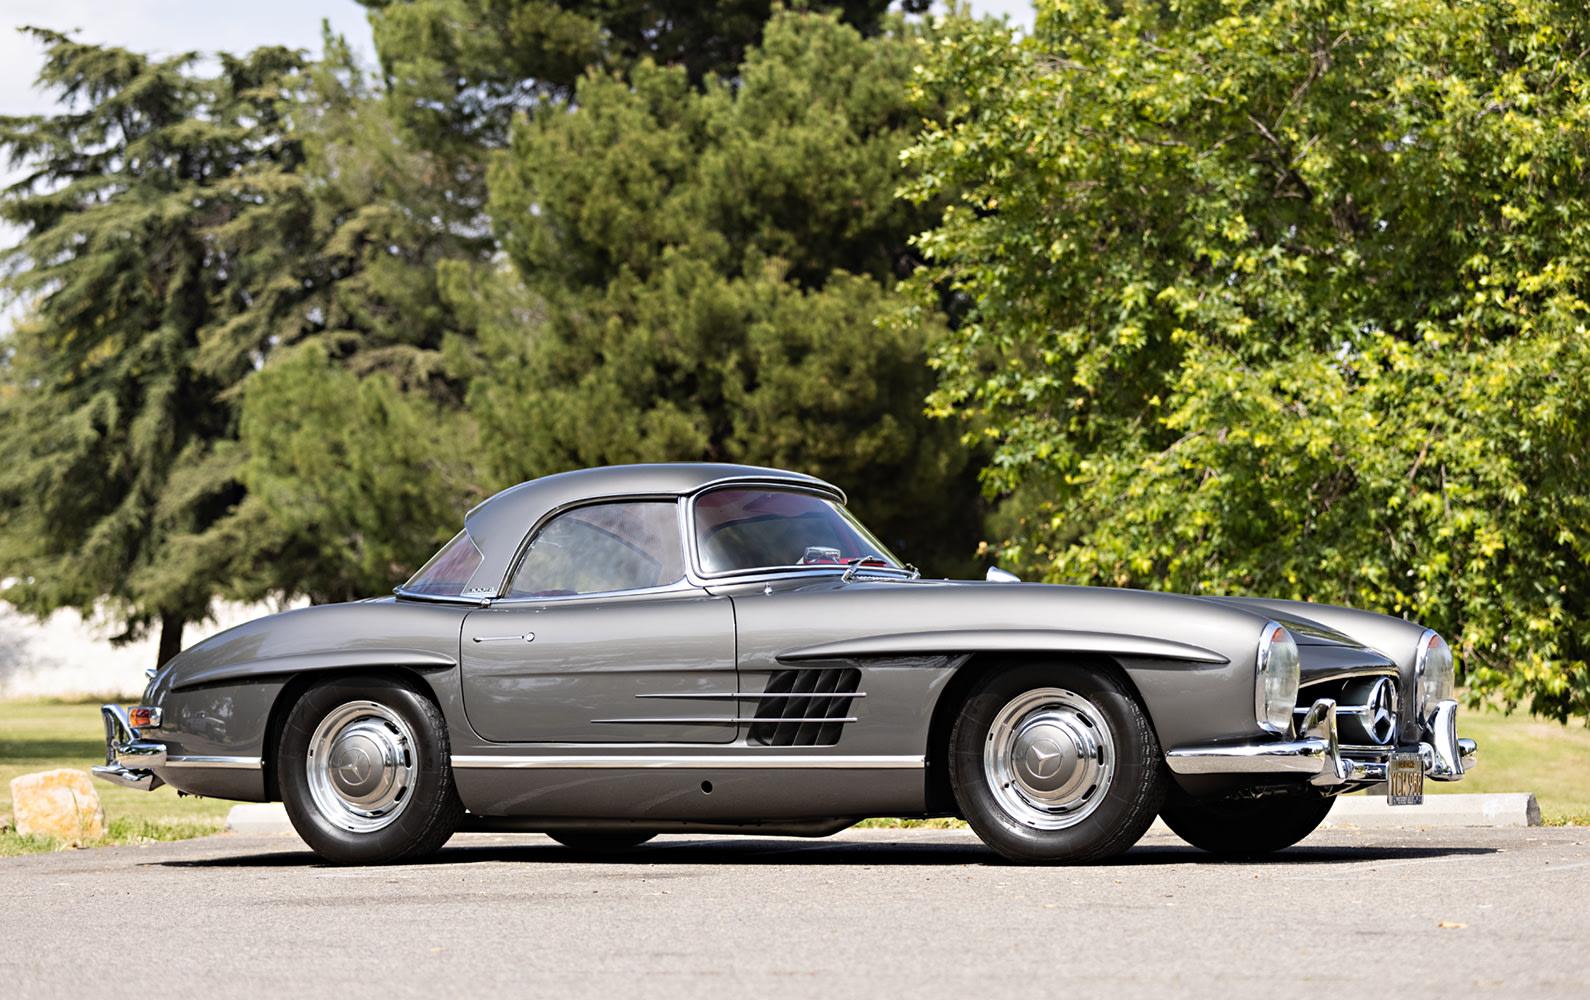 Prod/O21F - May 2021/1513_1961 Mercedes-Benz 300 SL Roadster/1961_Mercedes_Benz_300_SL_Roadster_3_injlzp